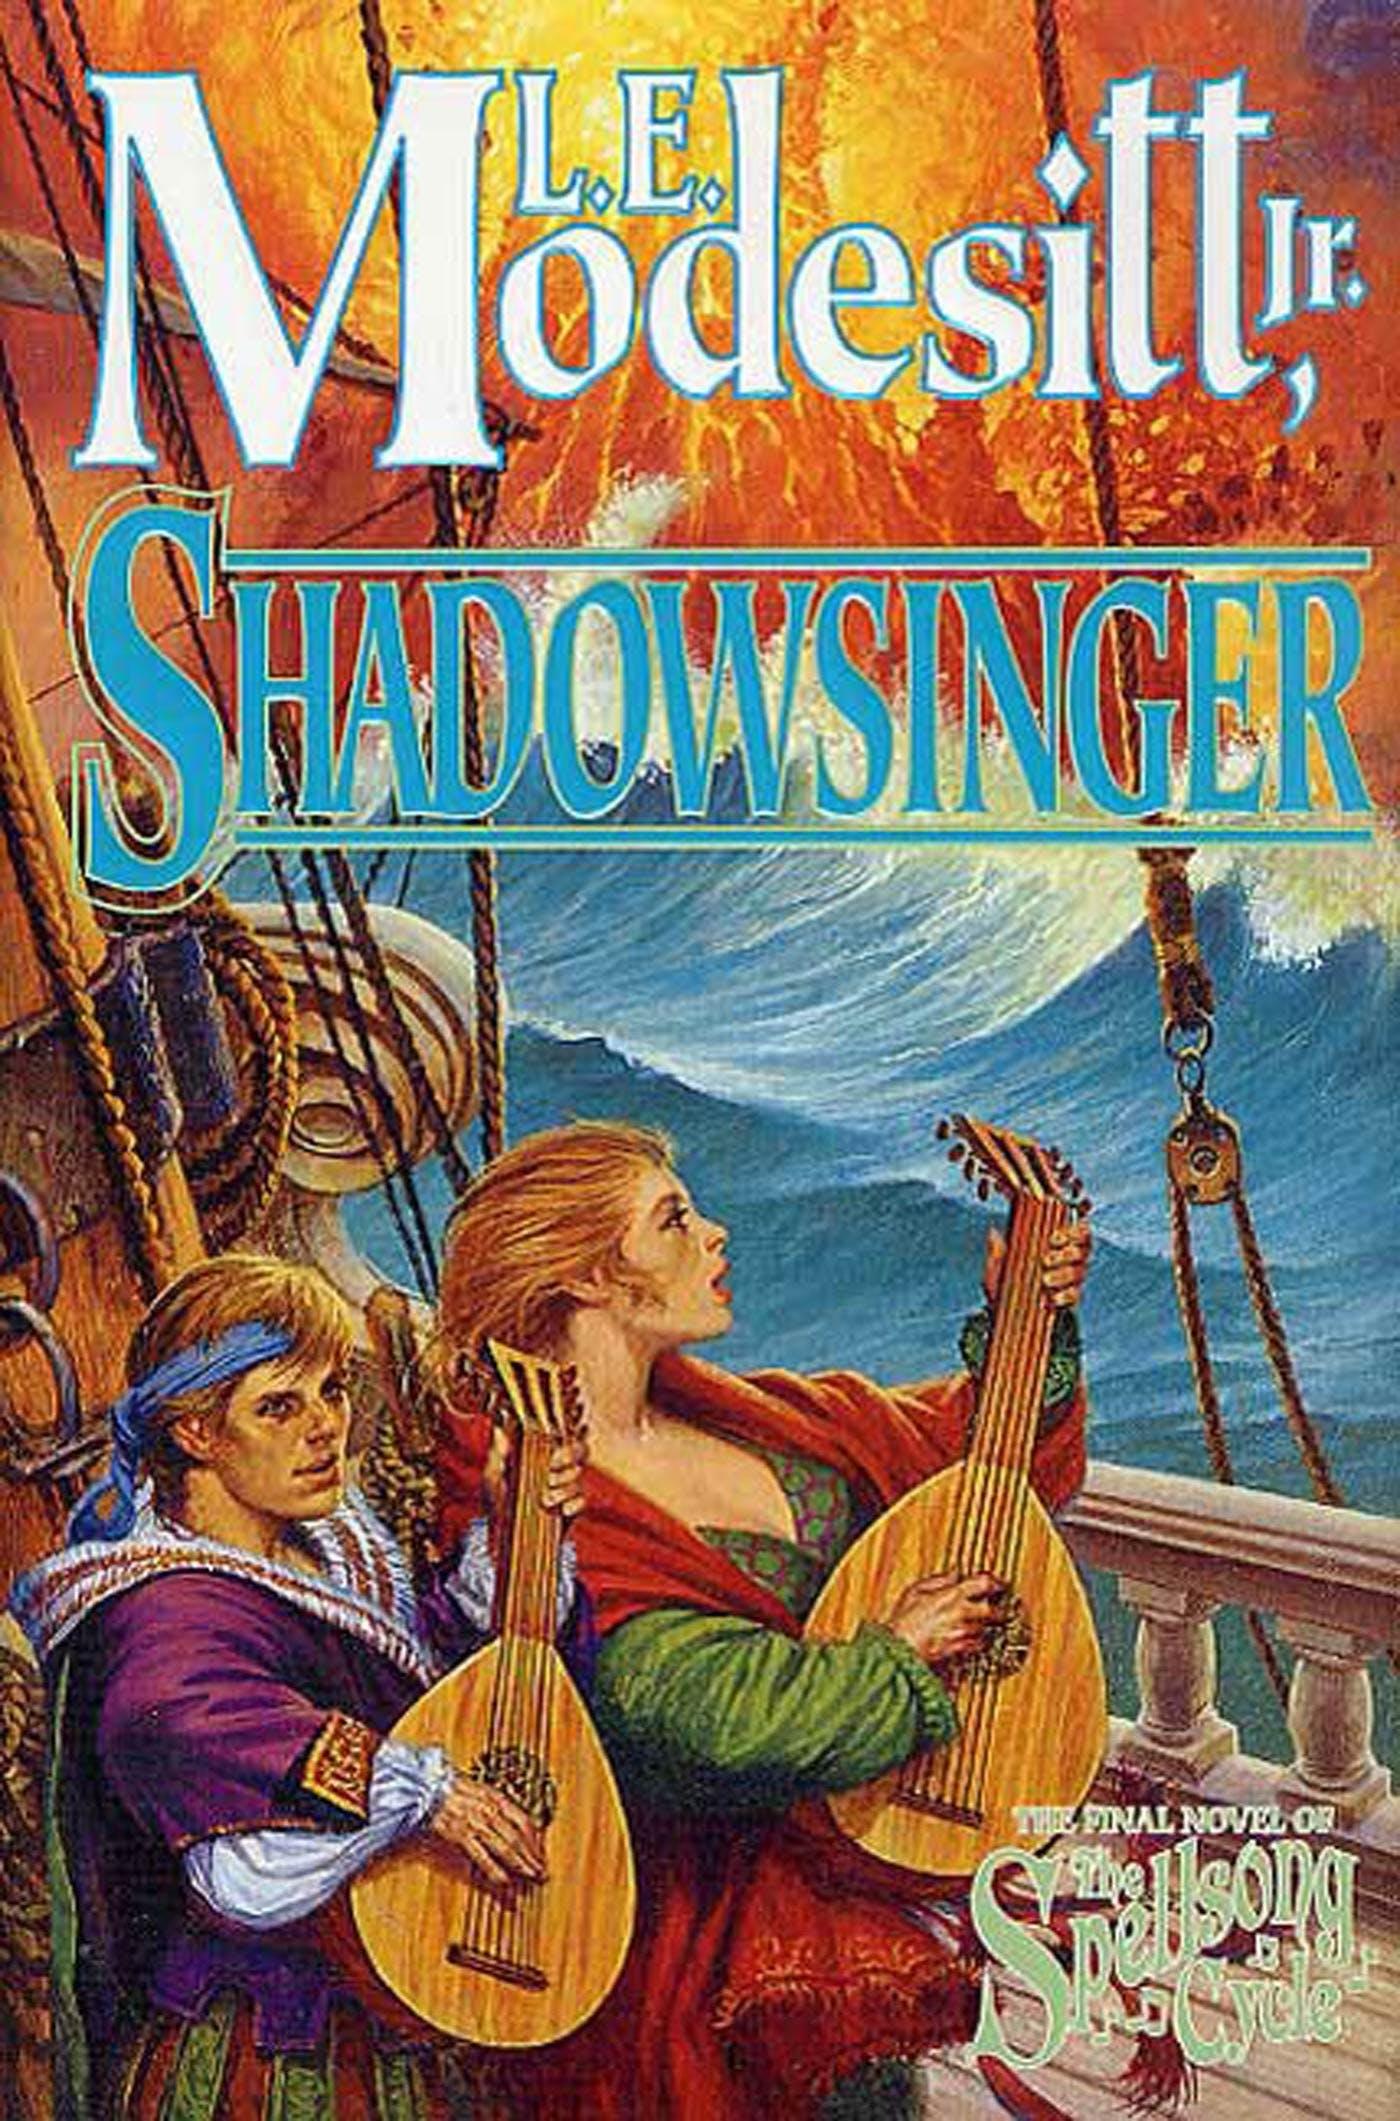 Image of Shadowsinger